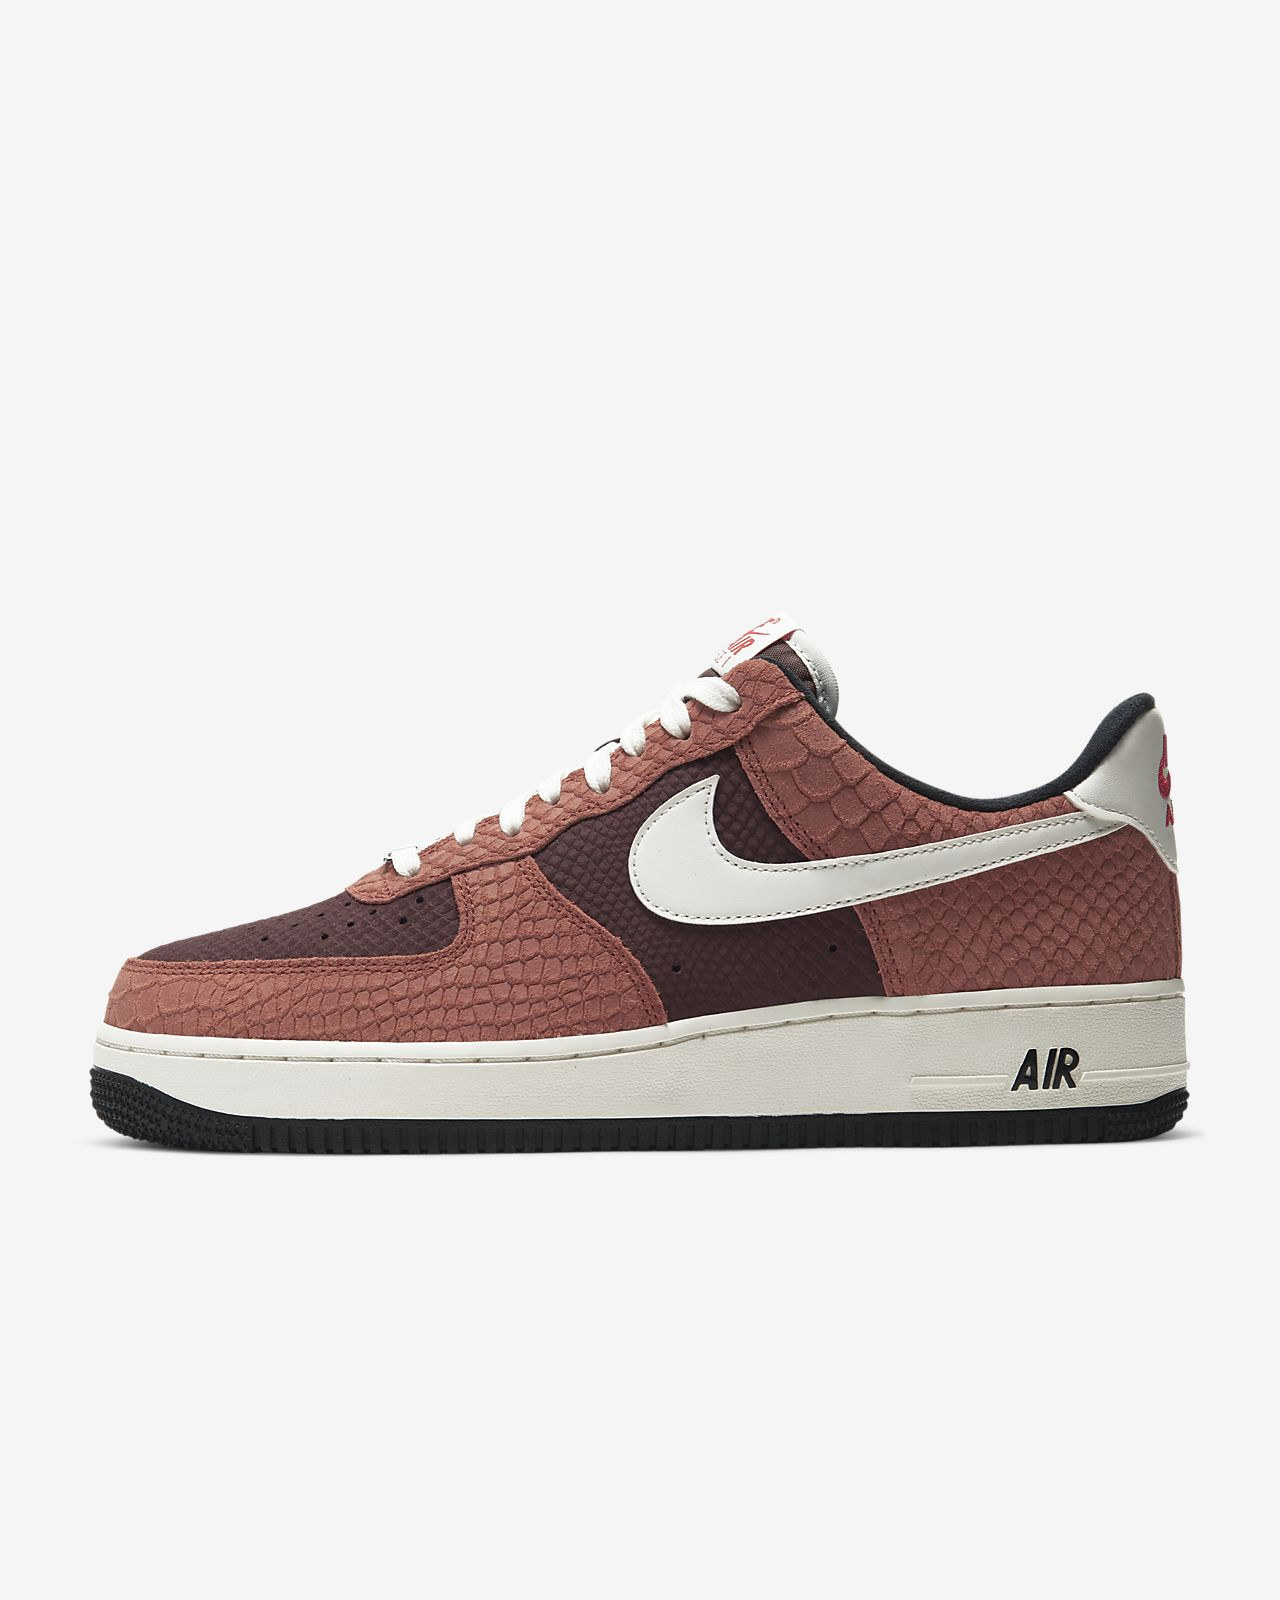 Casual Nike Air Force 1 Premium Mädchen Freizeit Schuhe